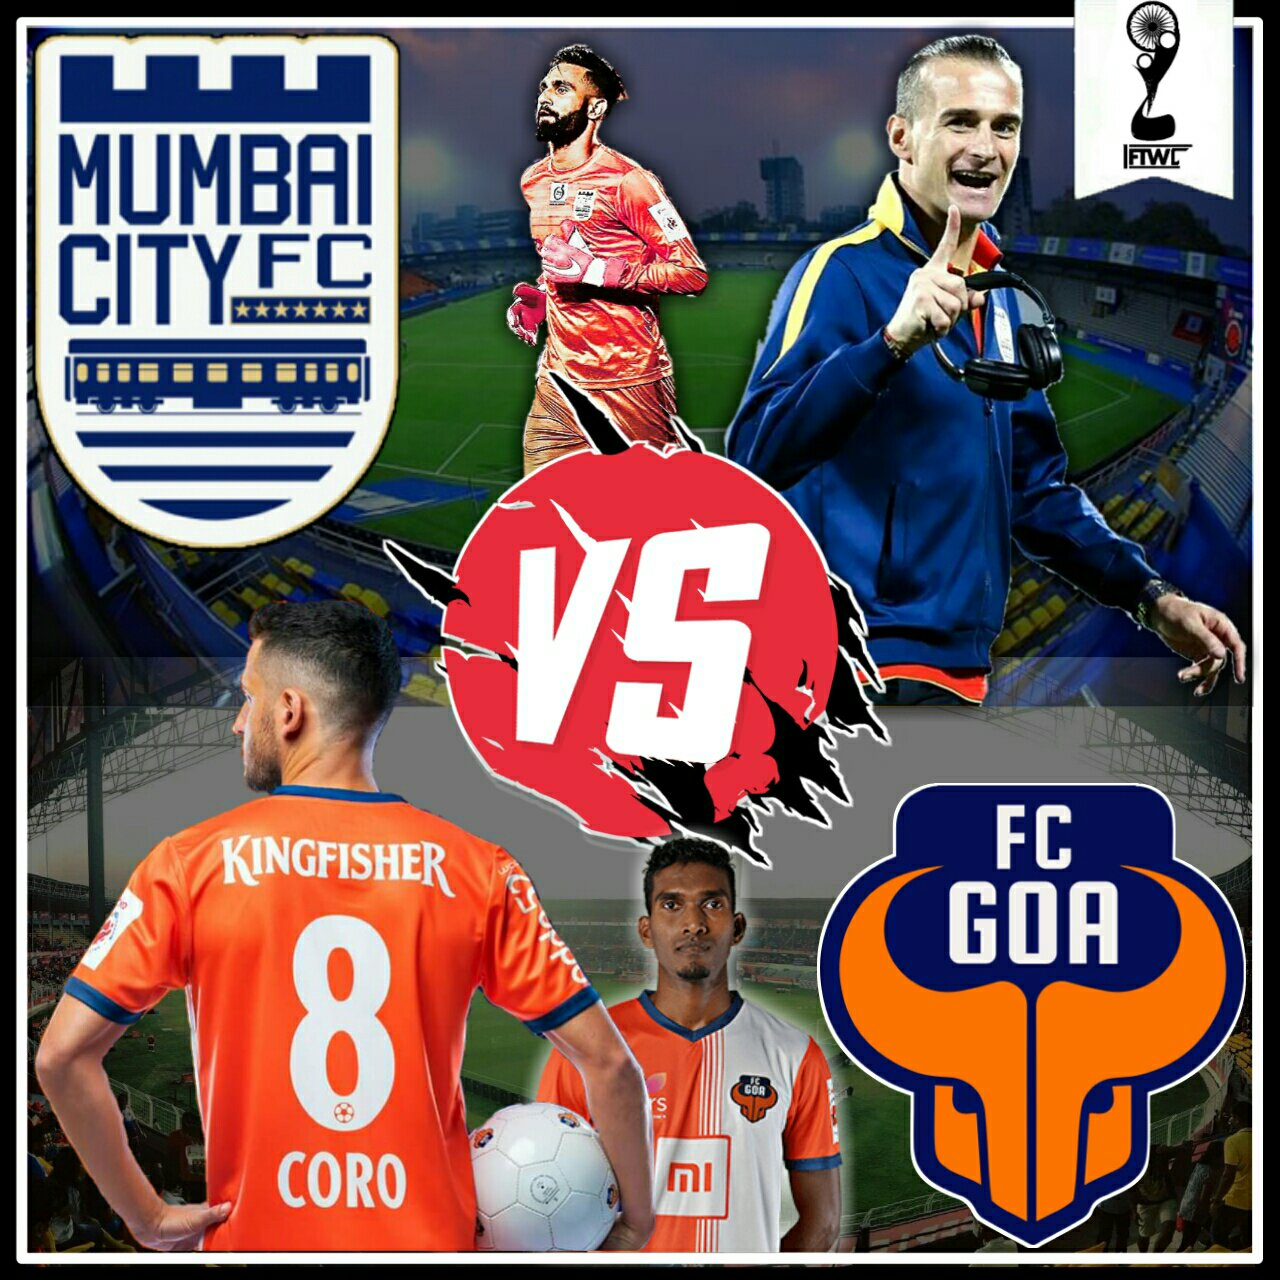 Why Mumbai City FC vs FC Goa promises to be Cracker of match? 20190303 1623041958120598